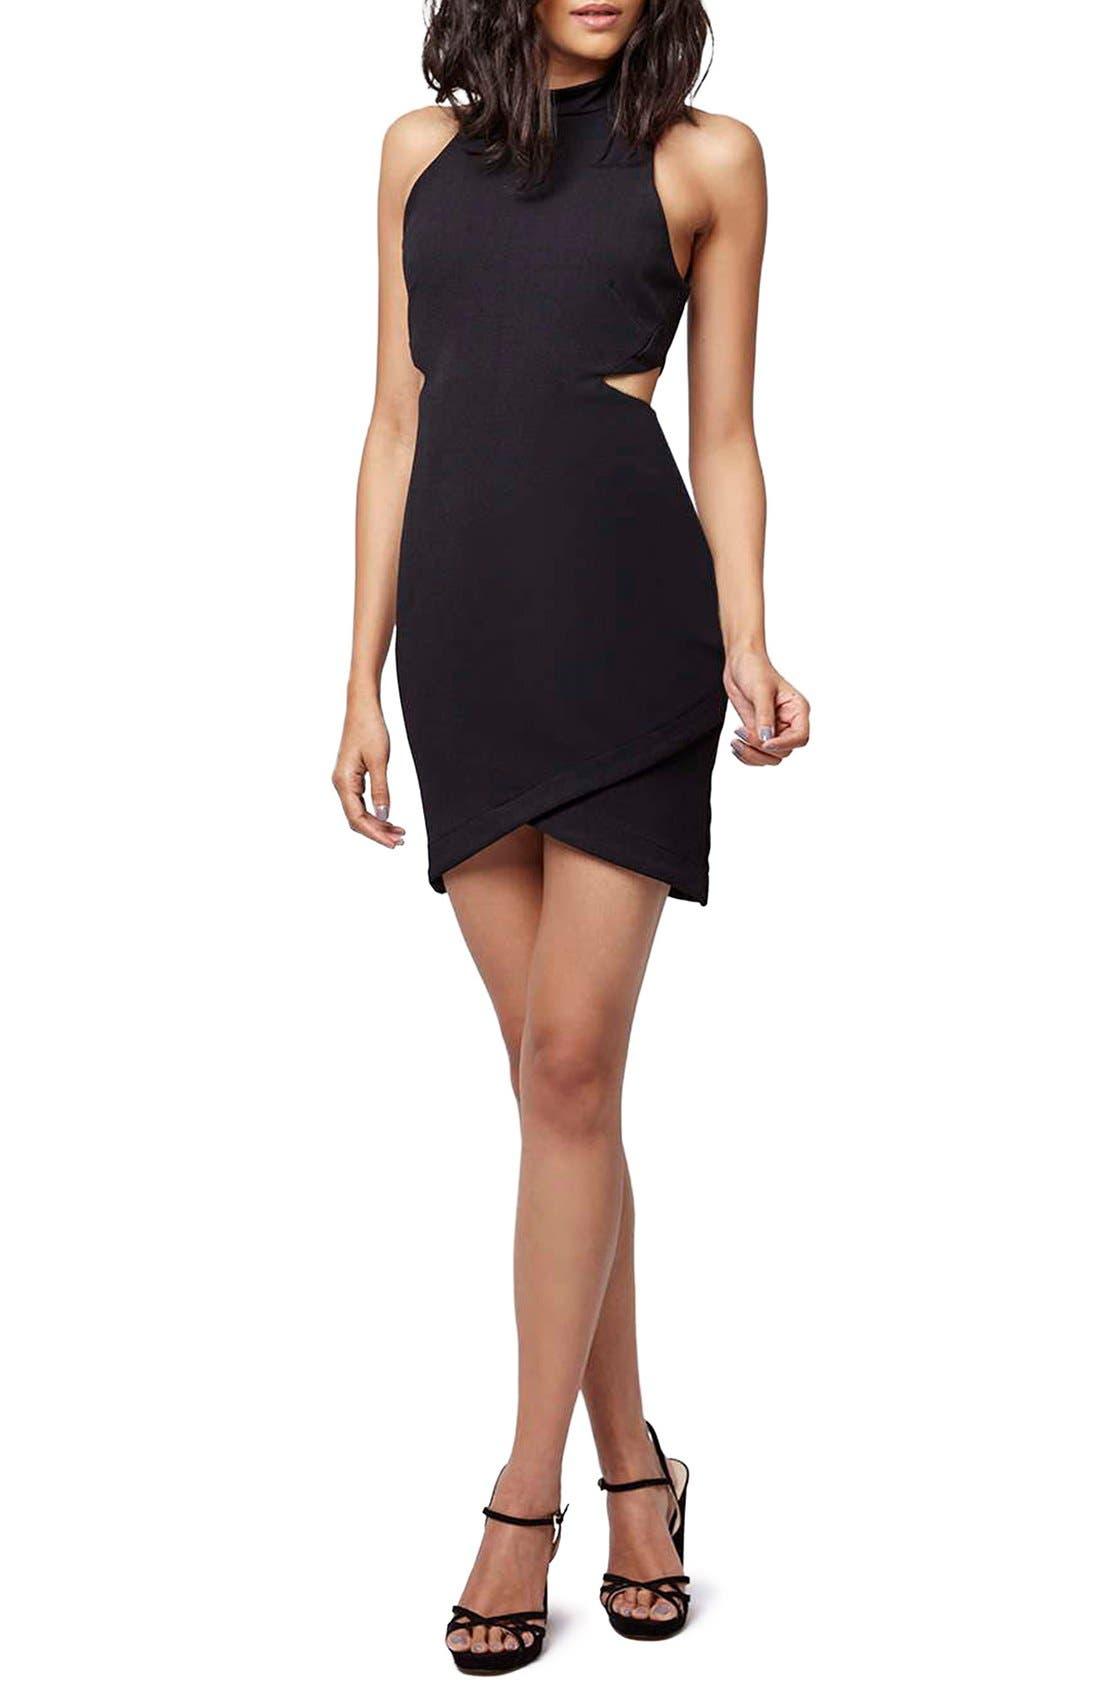 Alternate Image 1 Selected - Topshop Cutout Body-Con Dress (Petite)